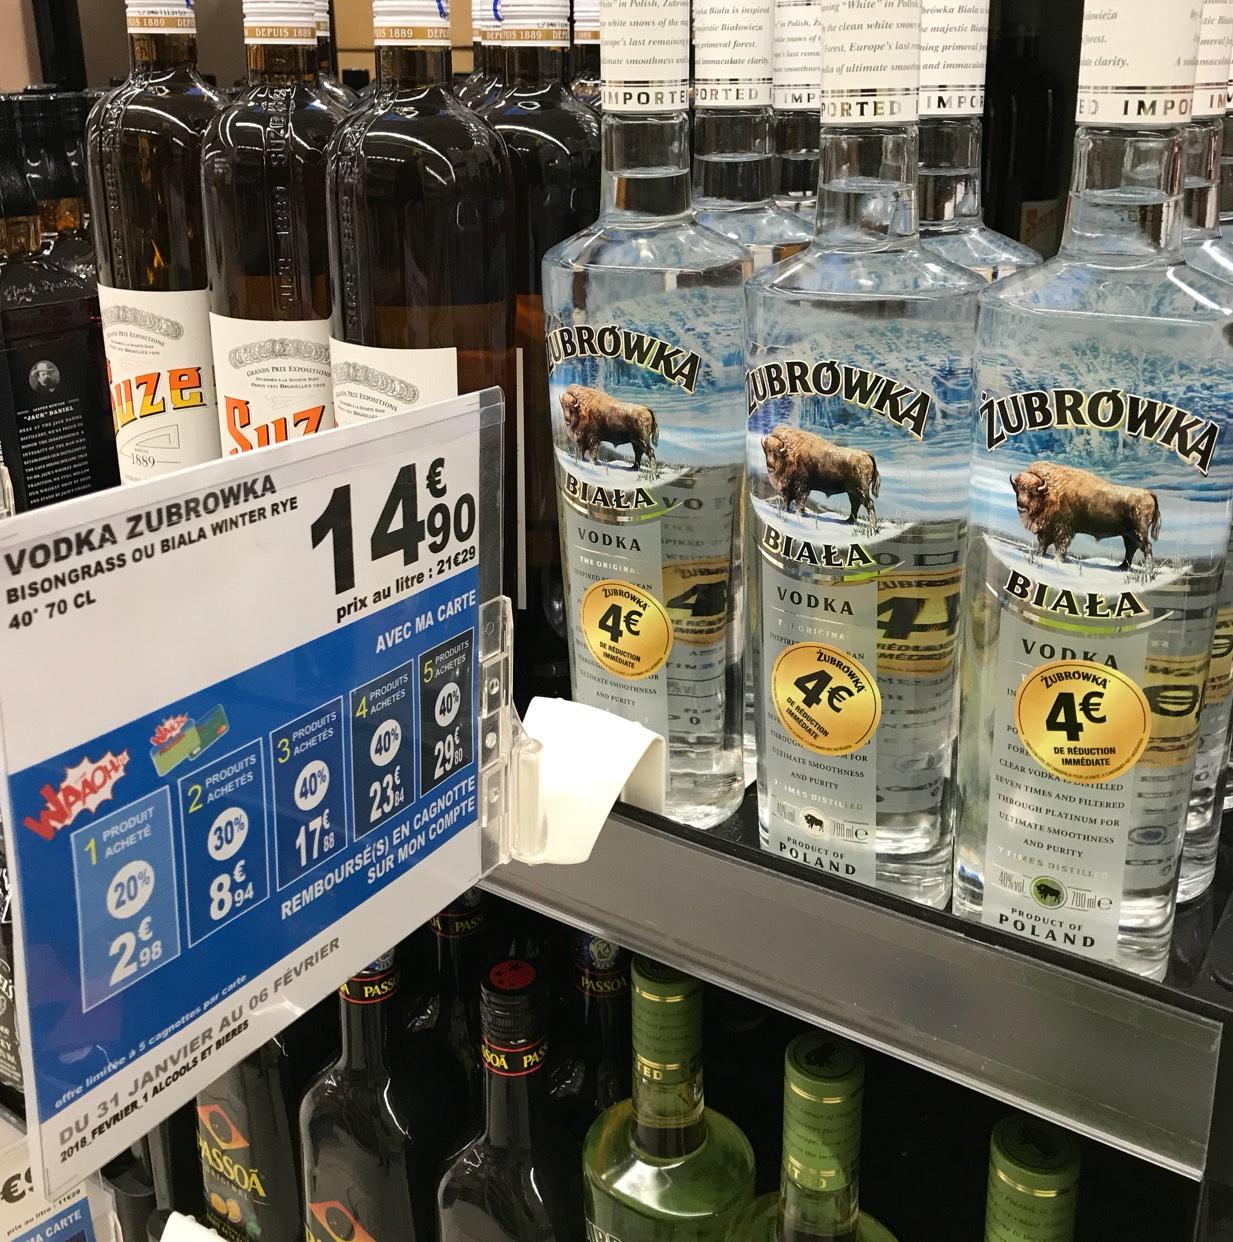 Bouteille de Vodka Zubrowka - Dieppe (76) / Orléans (45)